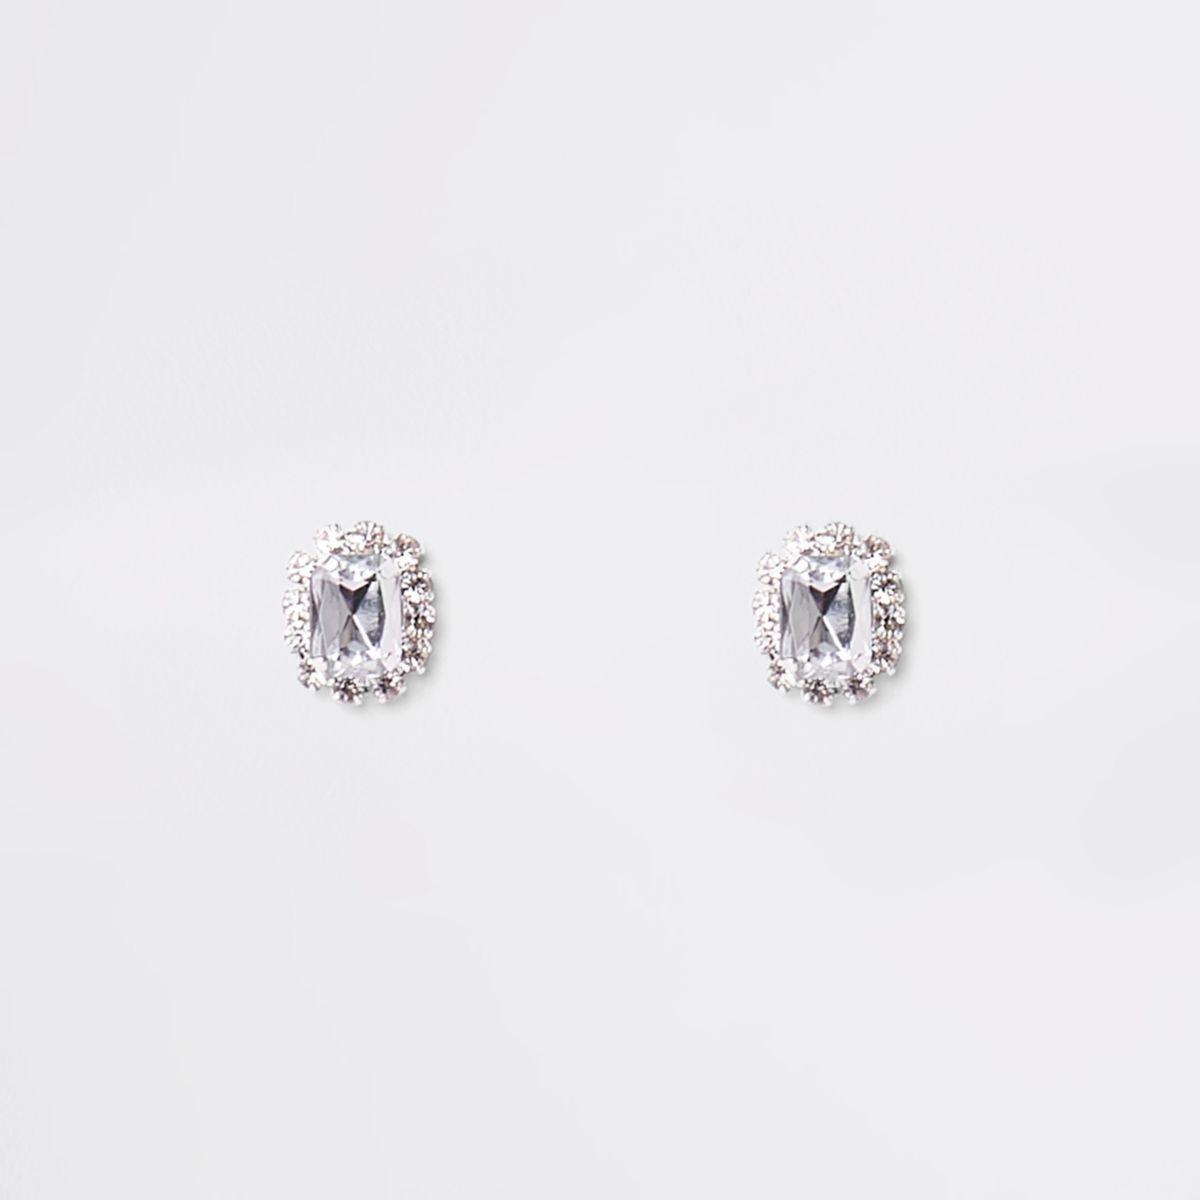 Silver tone diamante stone stud earrings